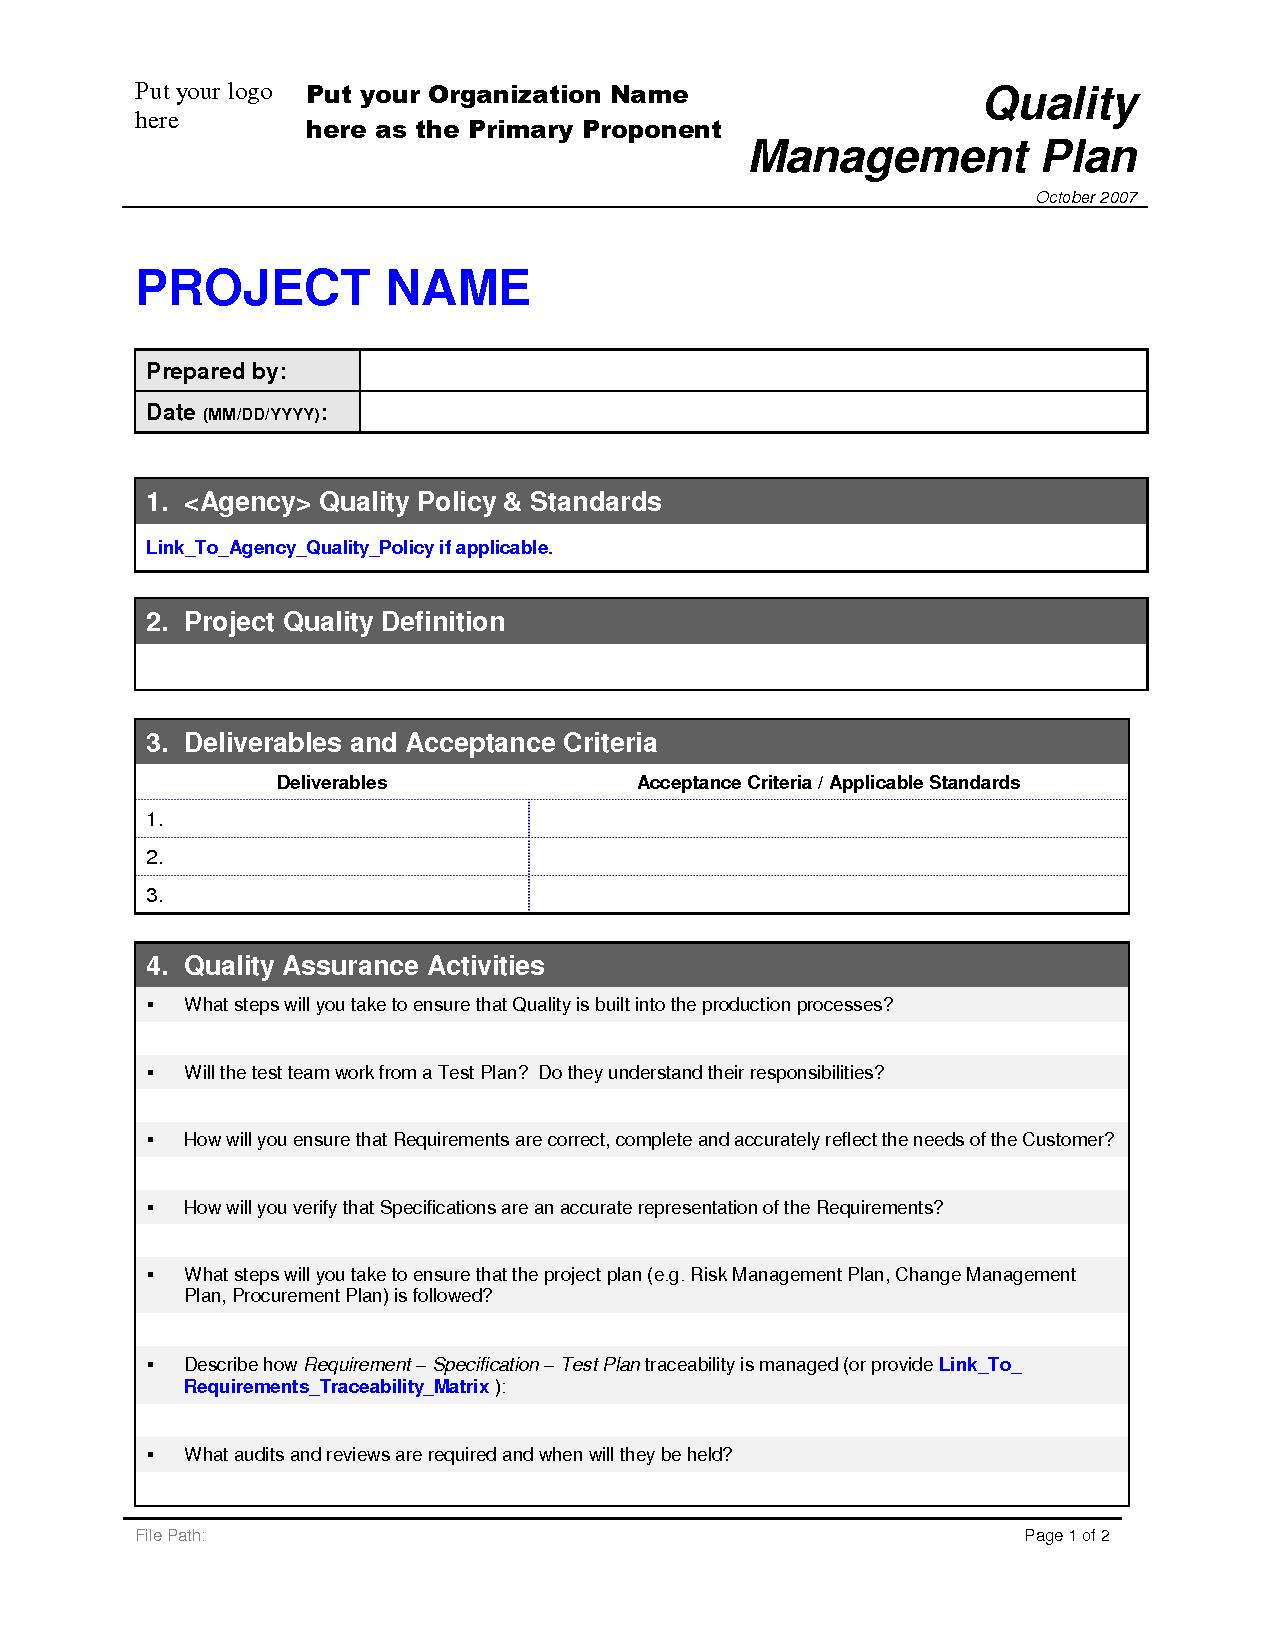 quality plan templates - Pertamini.co